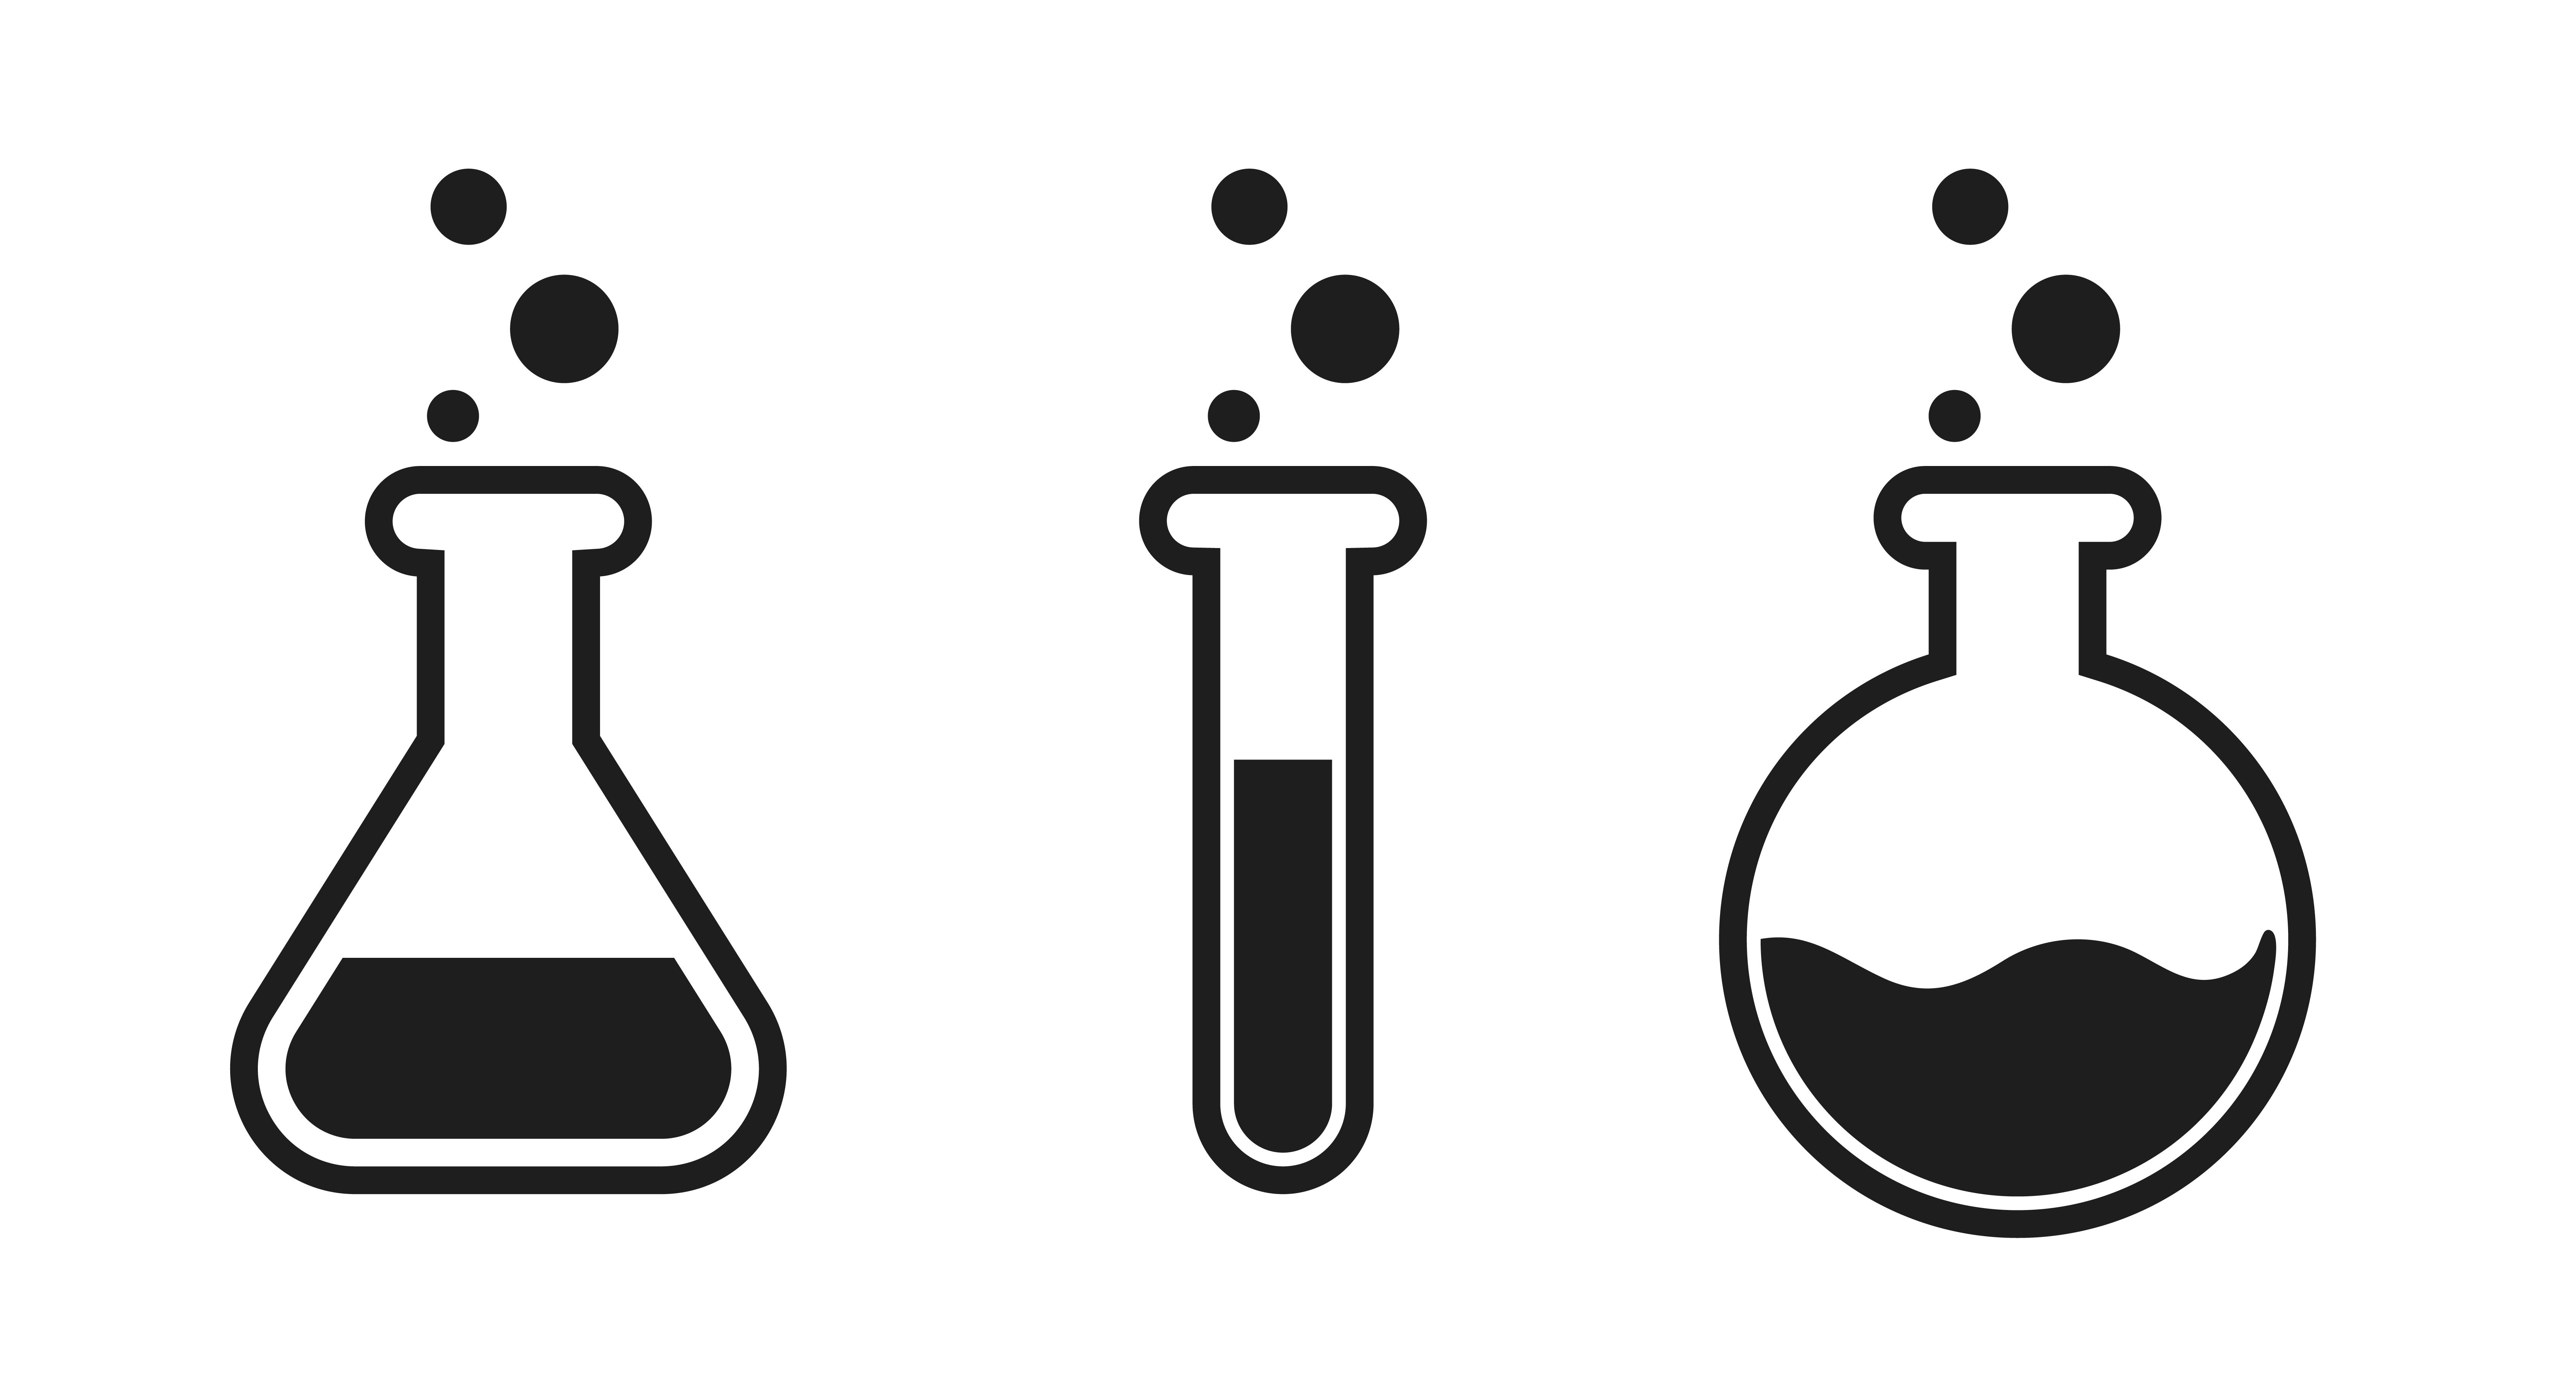 Liquid Test Tube Icon In The Science Laboratory